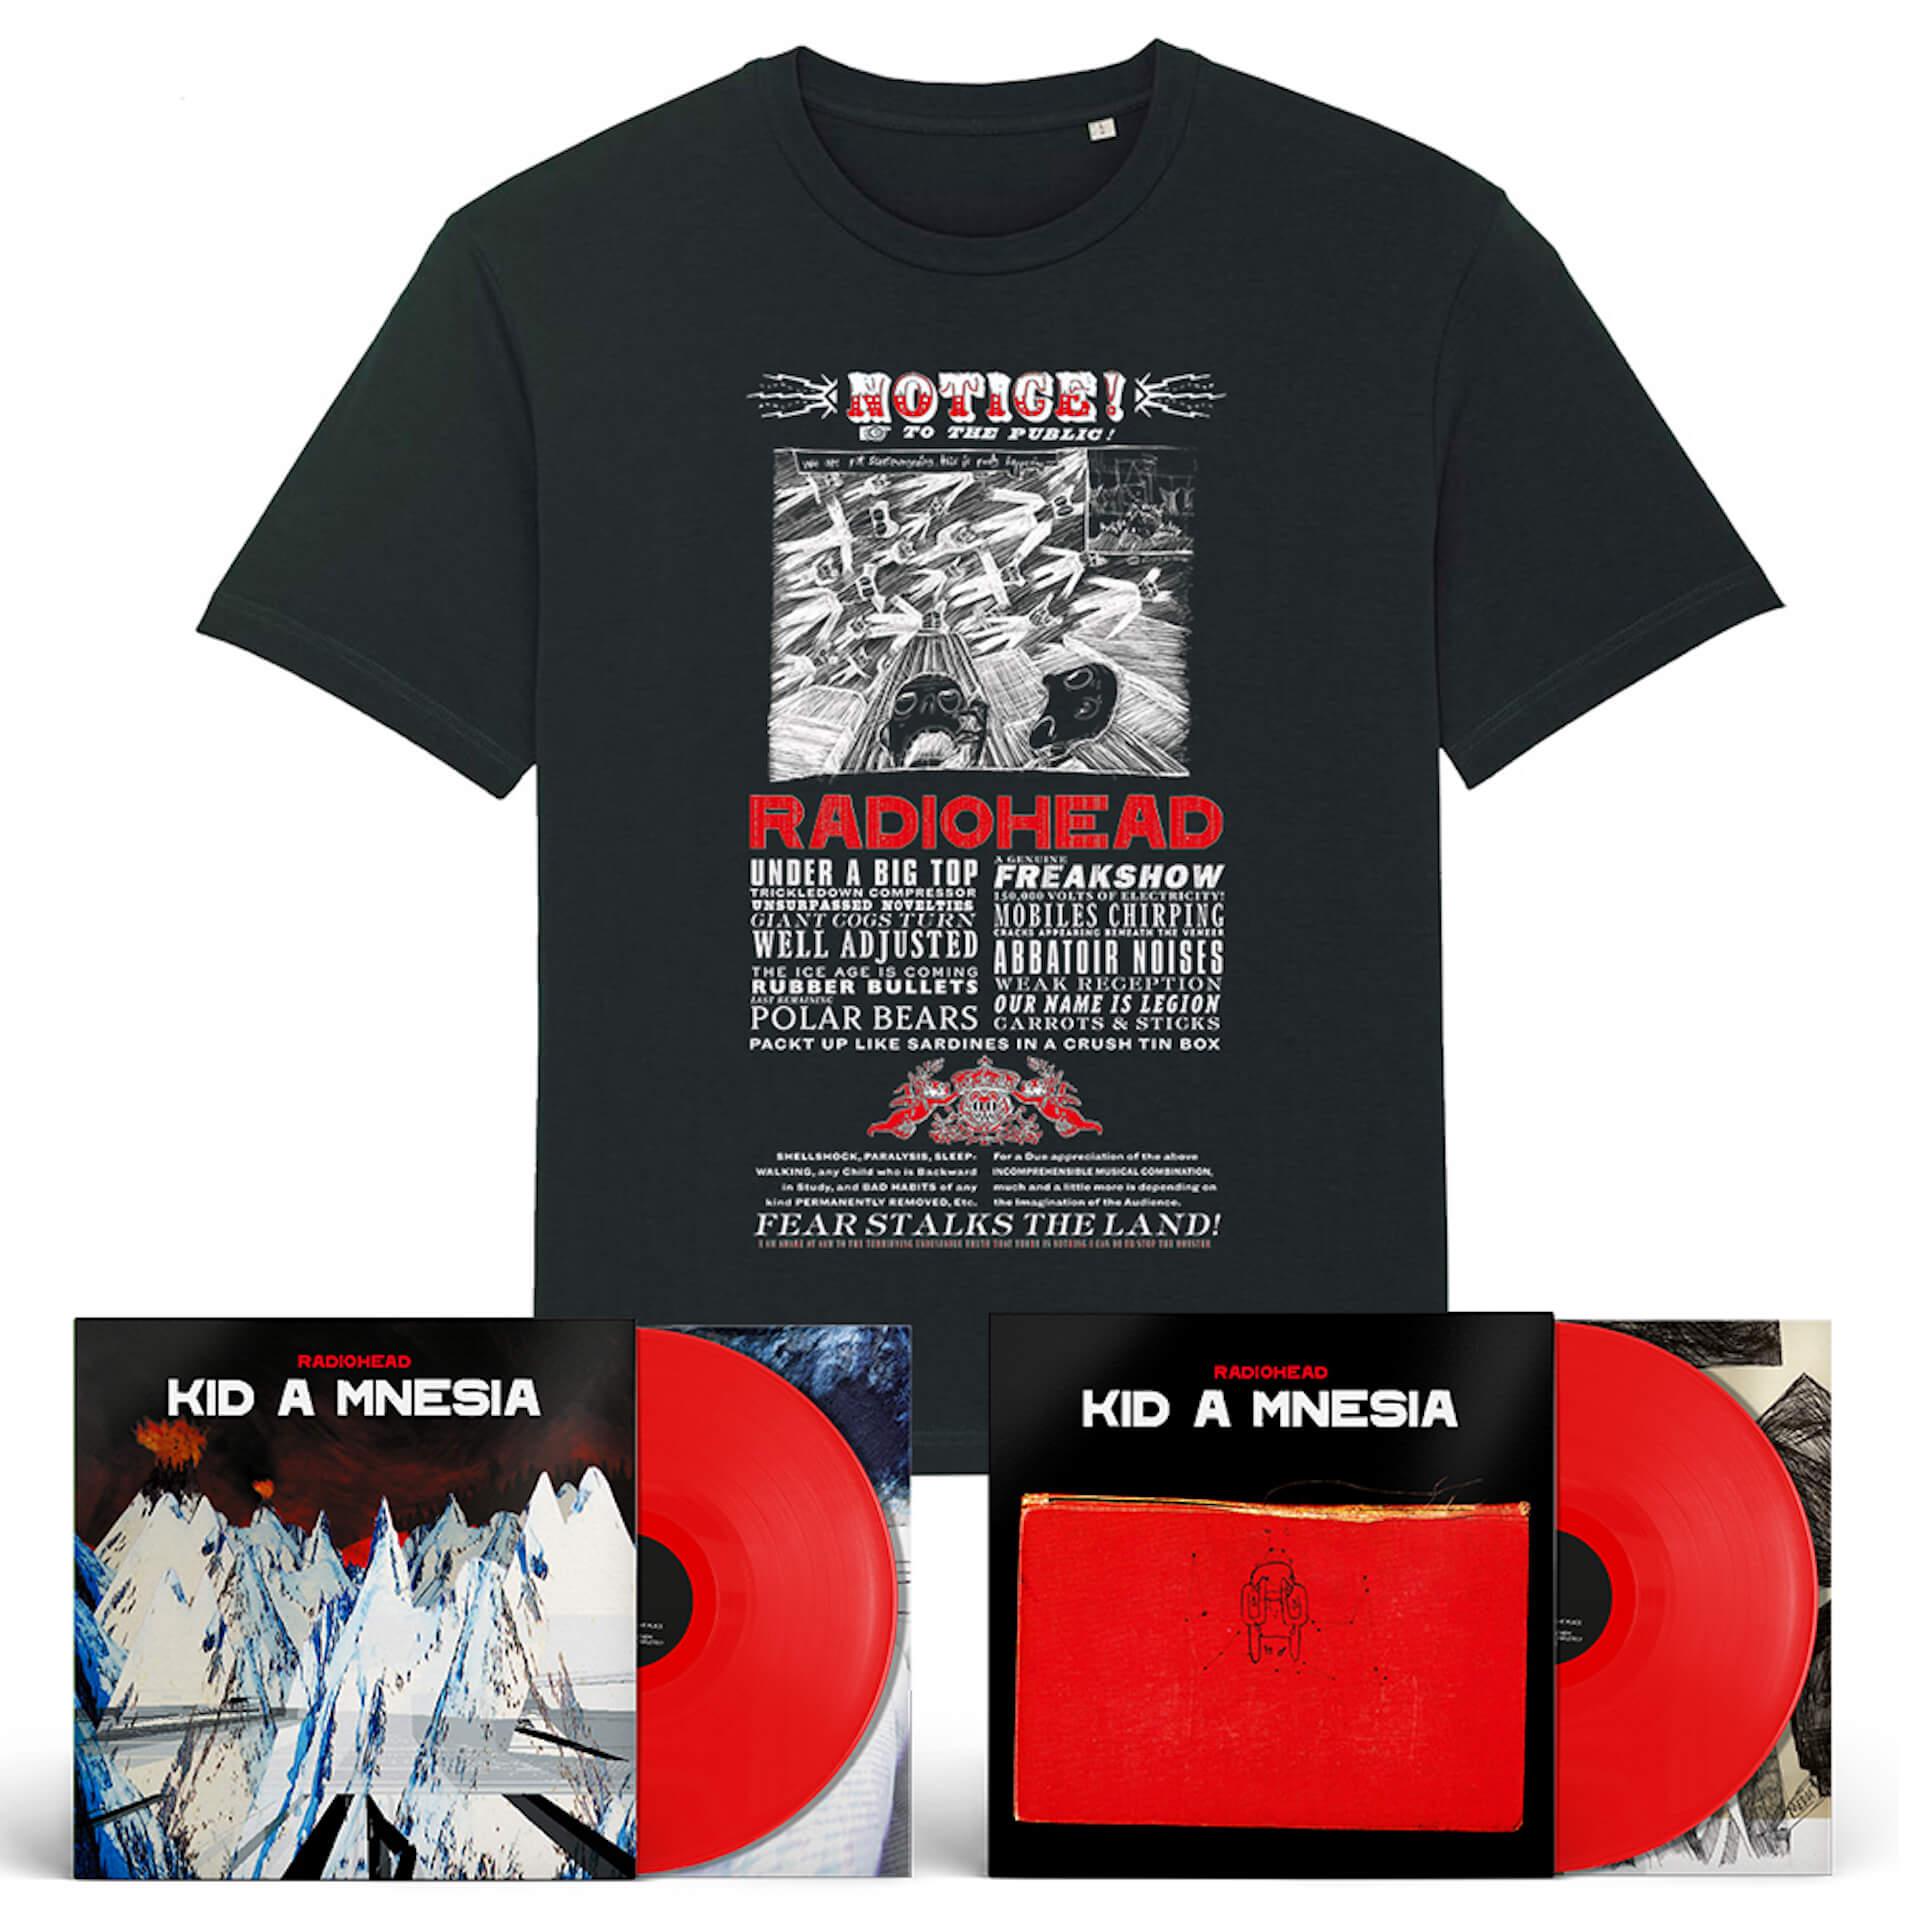 Radiohead『Kid A Mnesia』の日本限定バンドルが追加発売決定!最新オフィシャルTシャツも付属 music210915_radiohead_2